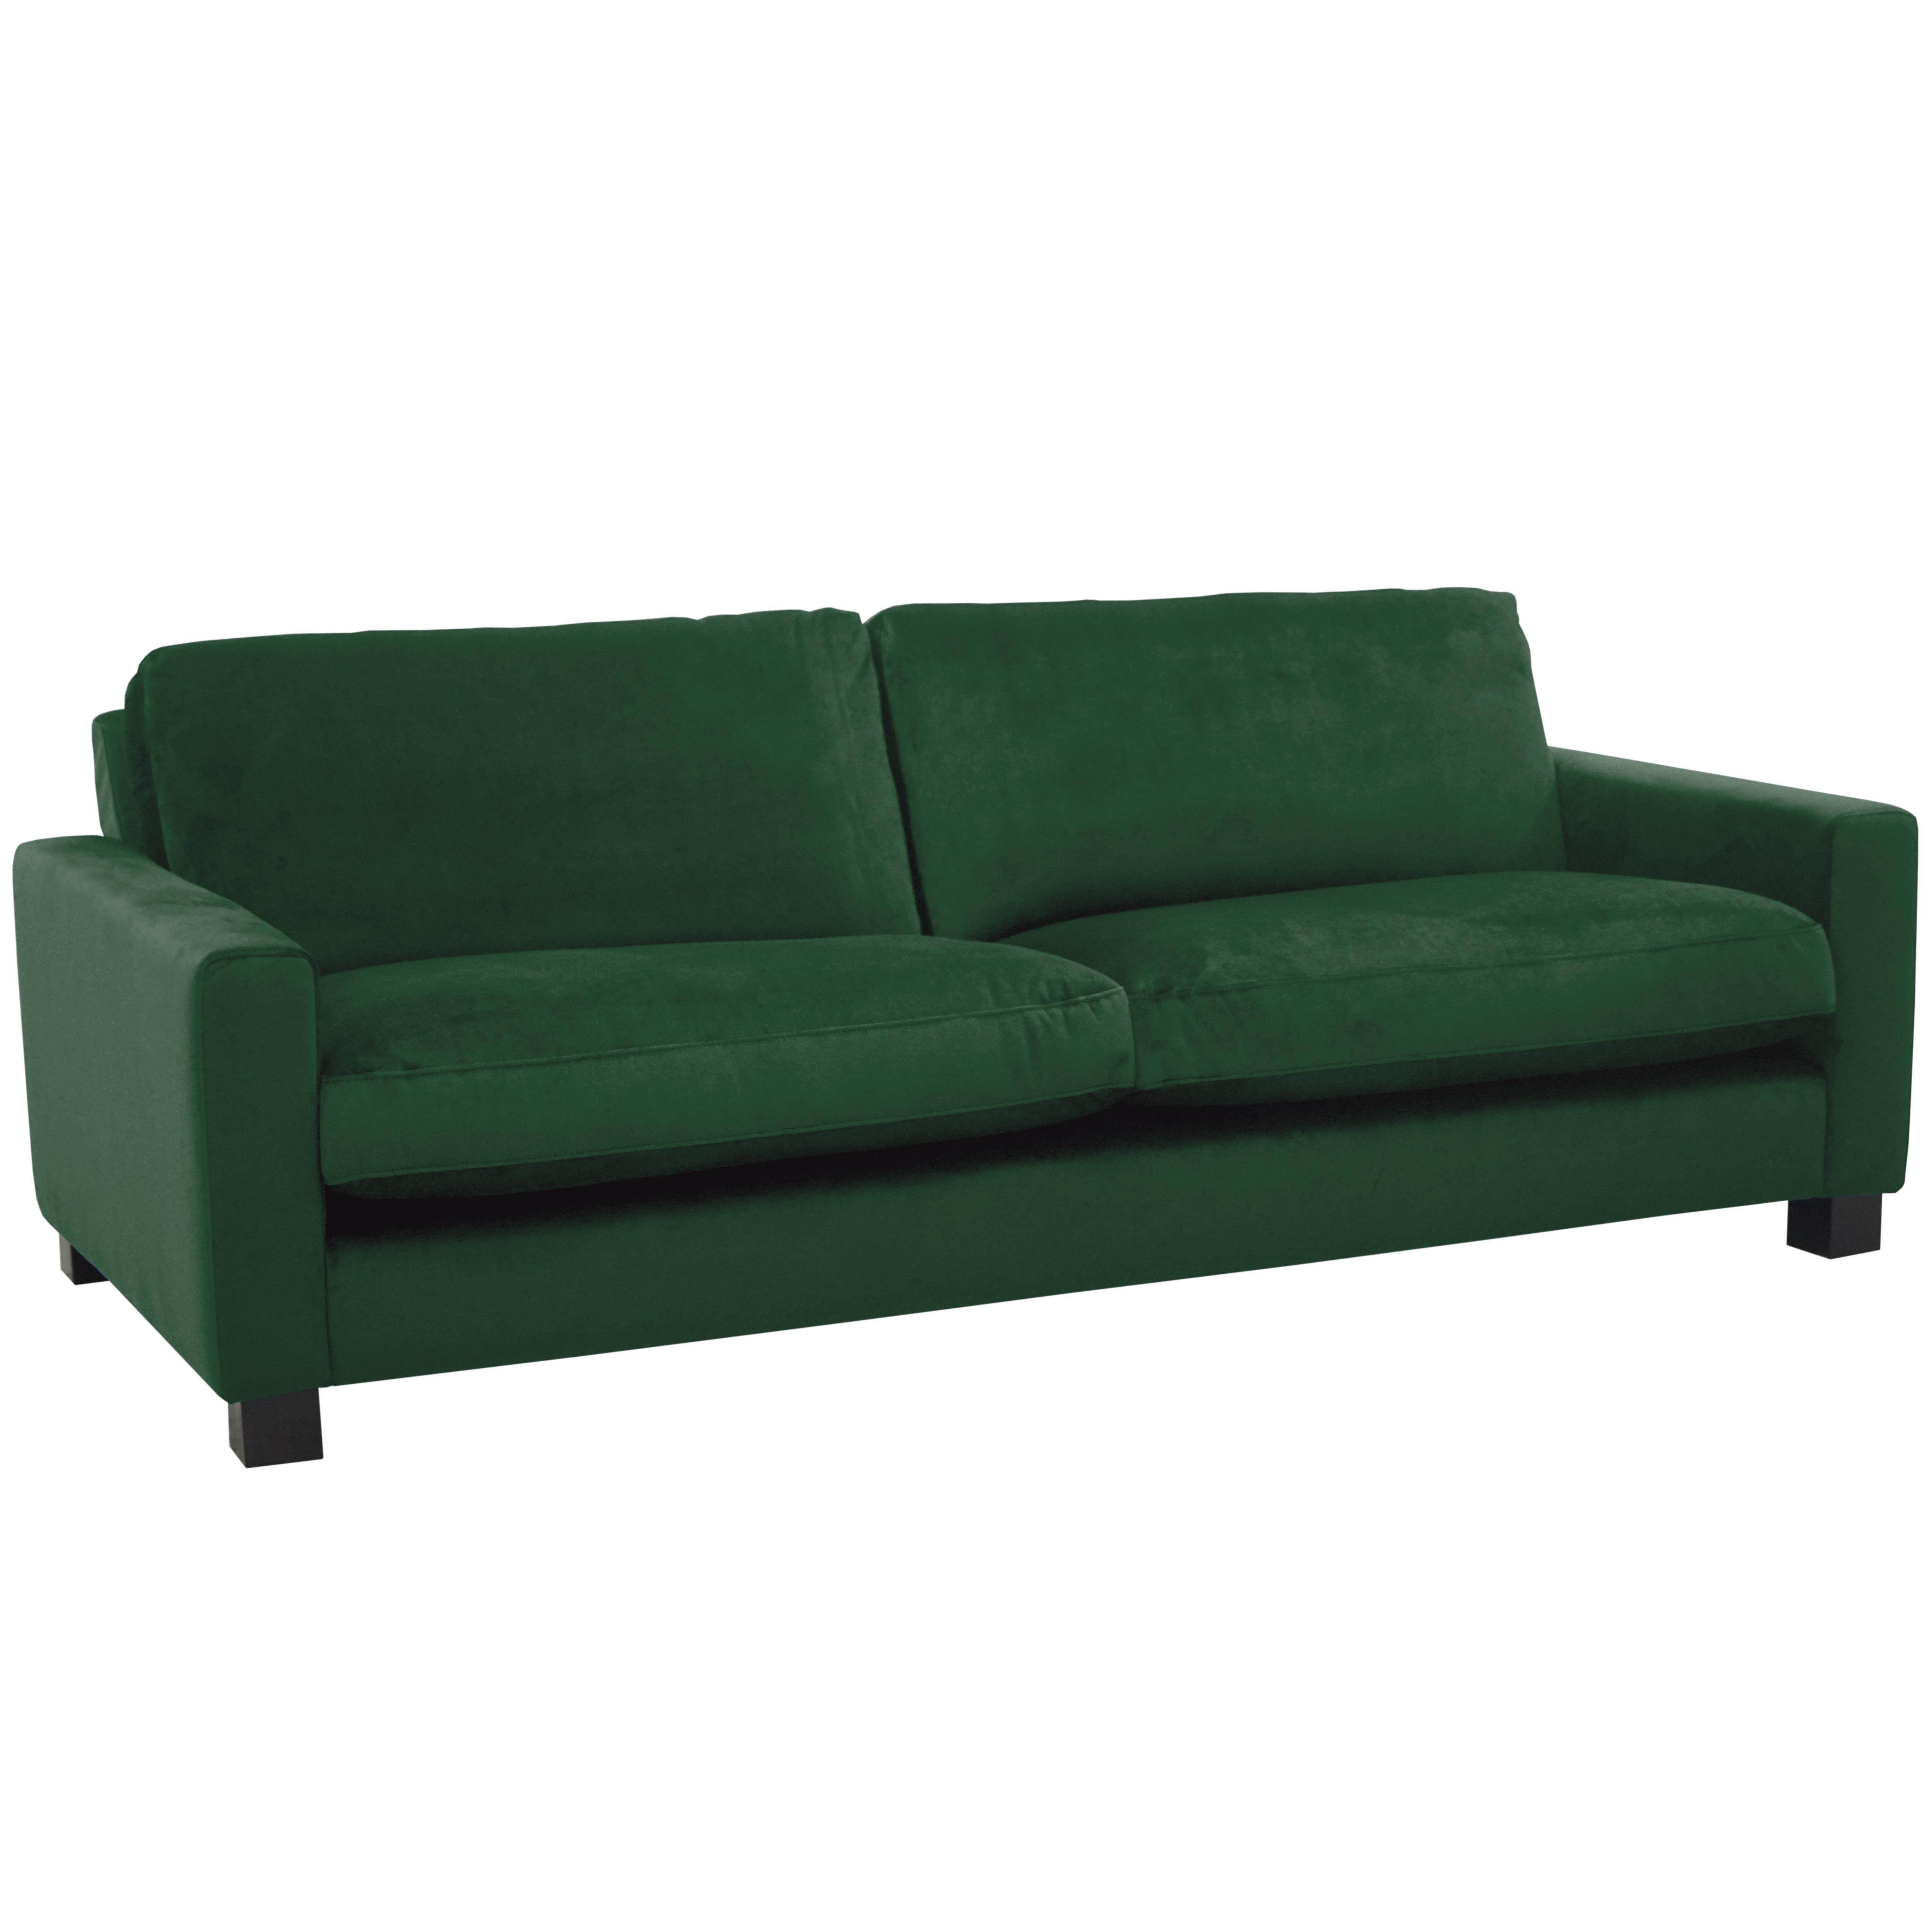 Monaco three seater sofa alba velvet forest green